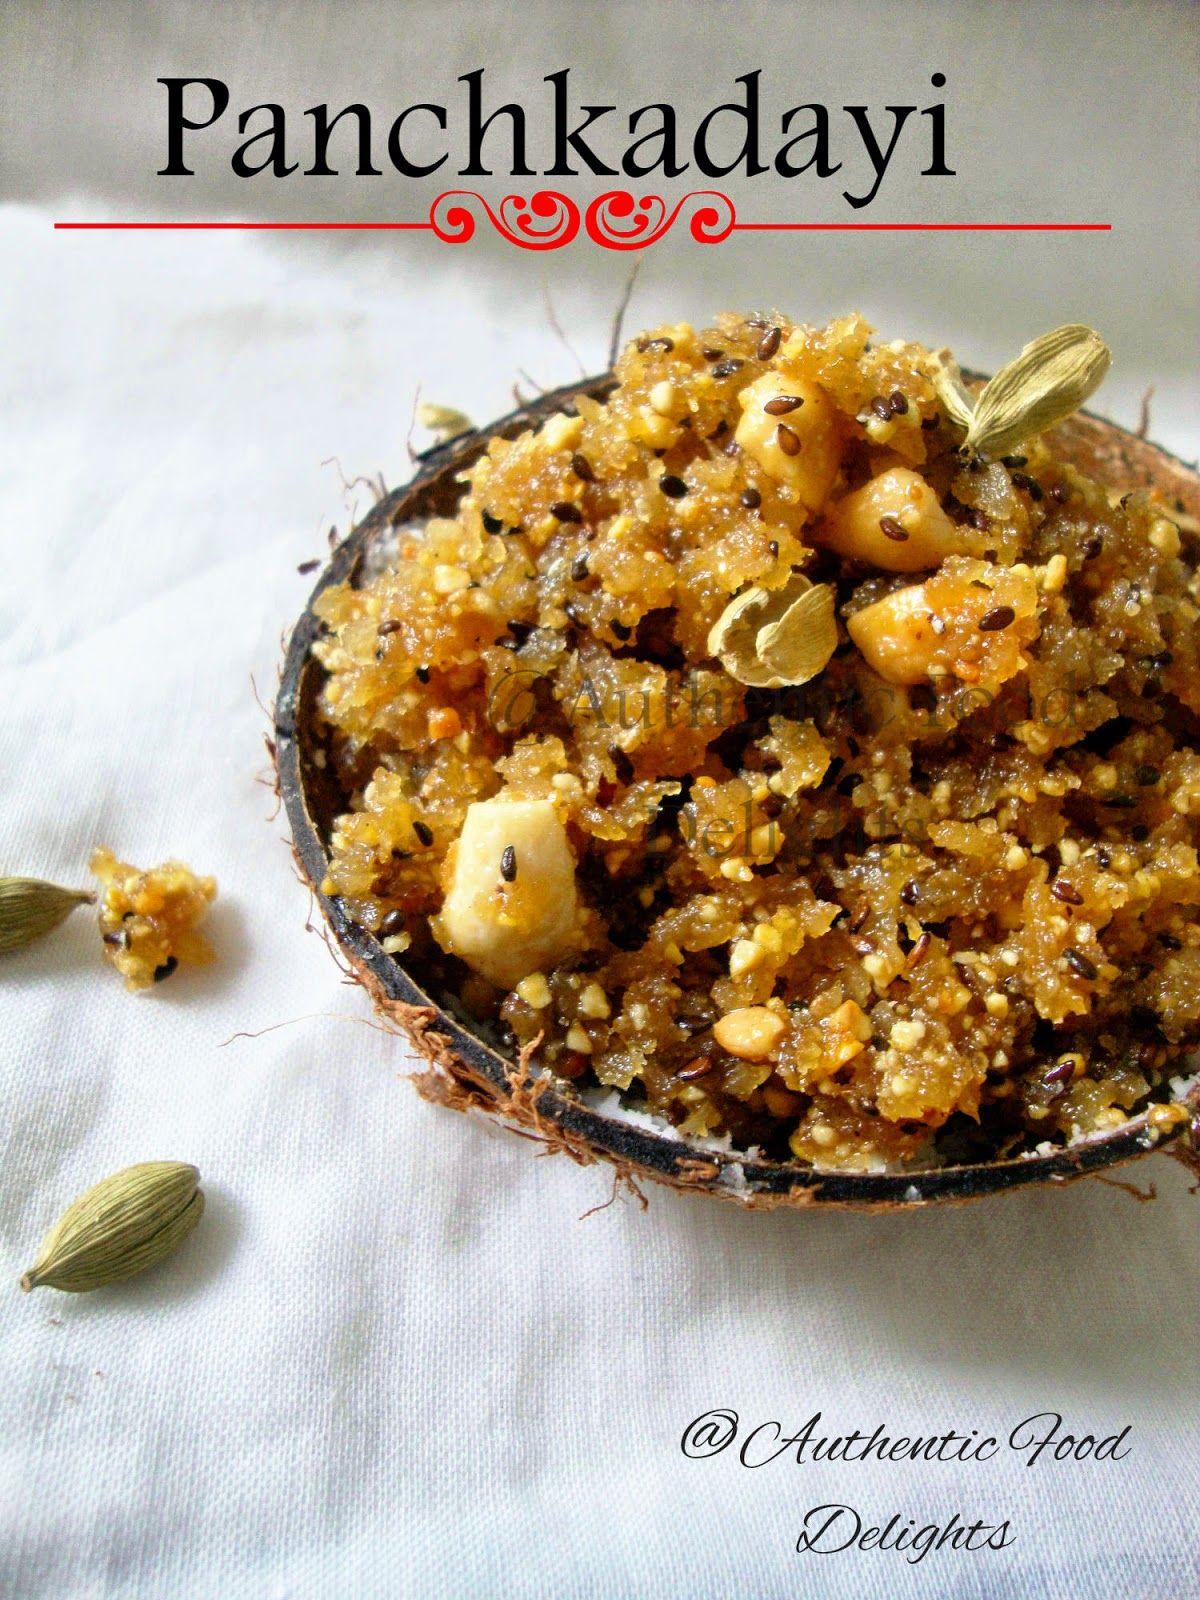 Authentic Food Delights: Konkani Amchi dishes | Inspiration